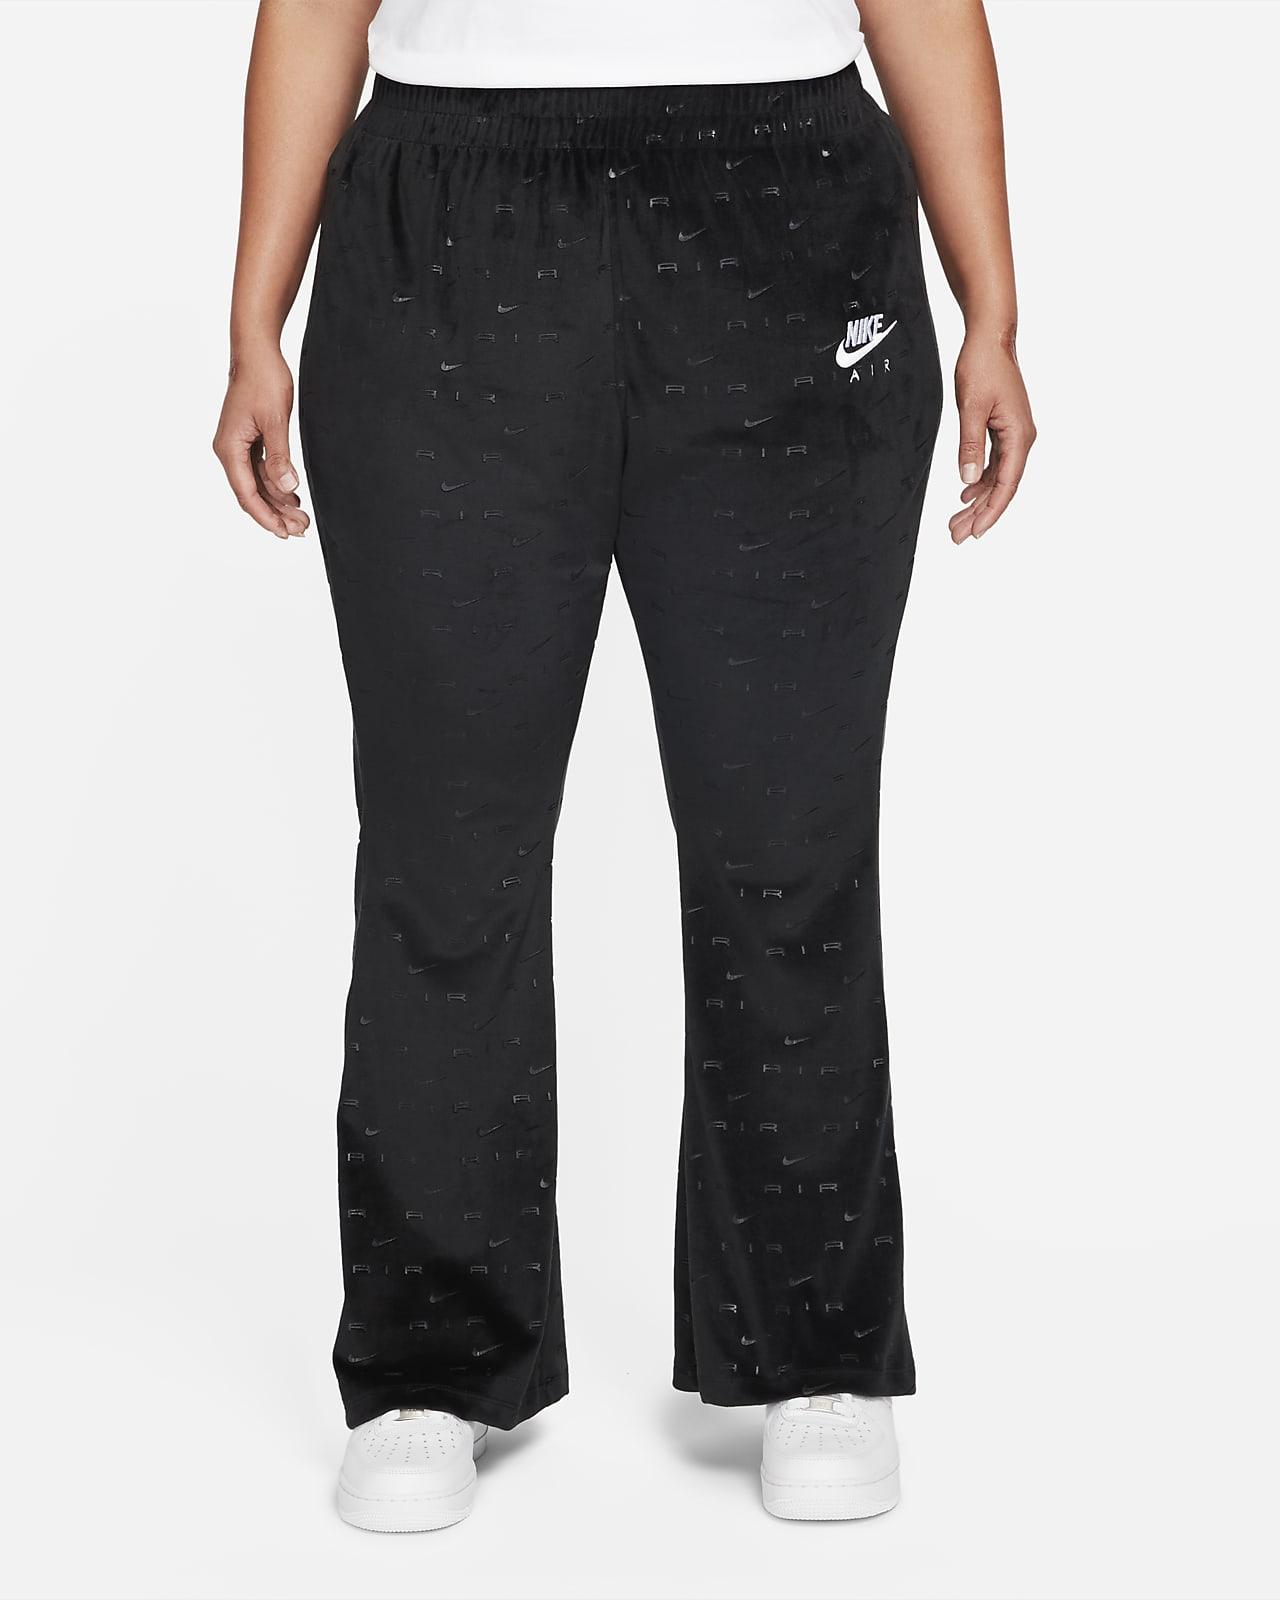 Nike Air Women's Velour Mid-Rise Pants (Plus Size)